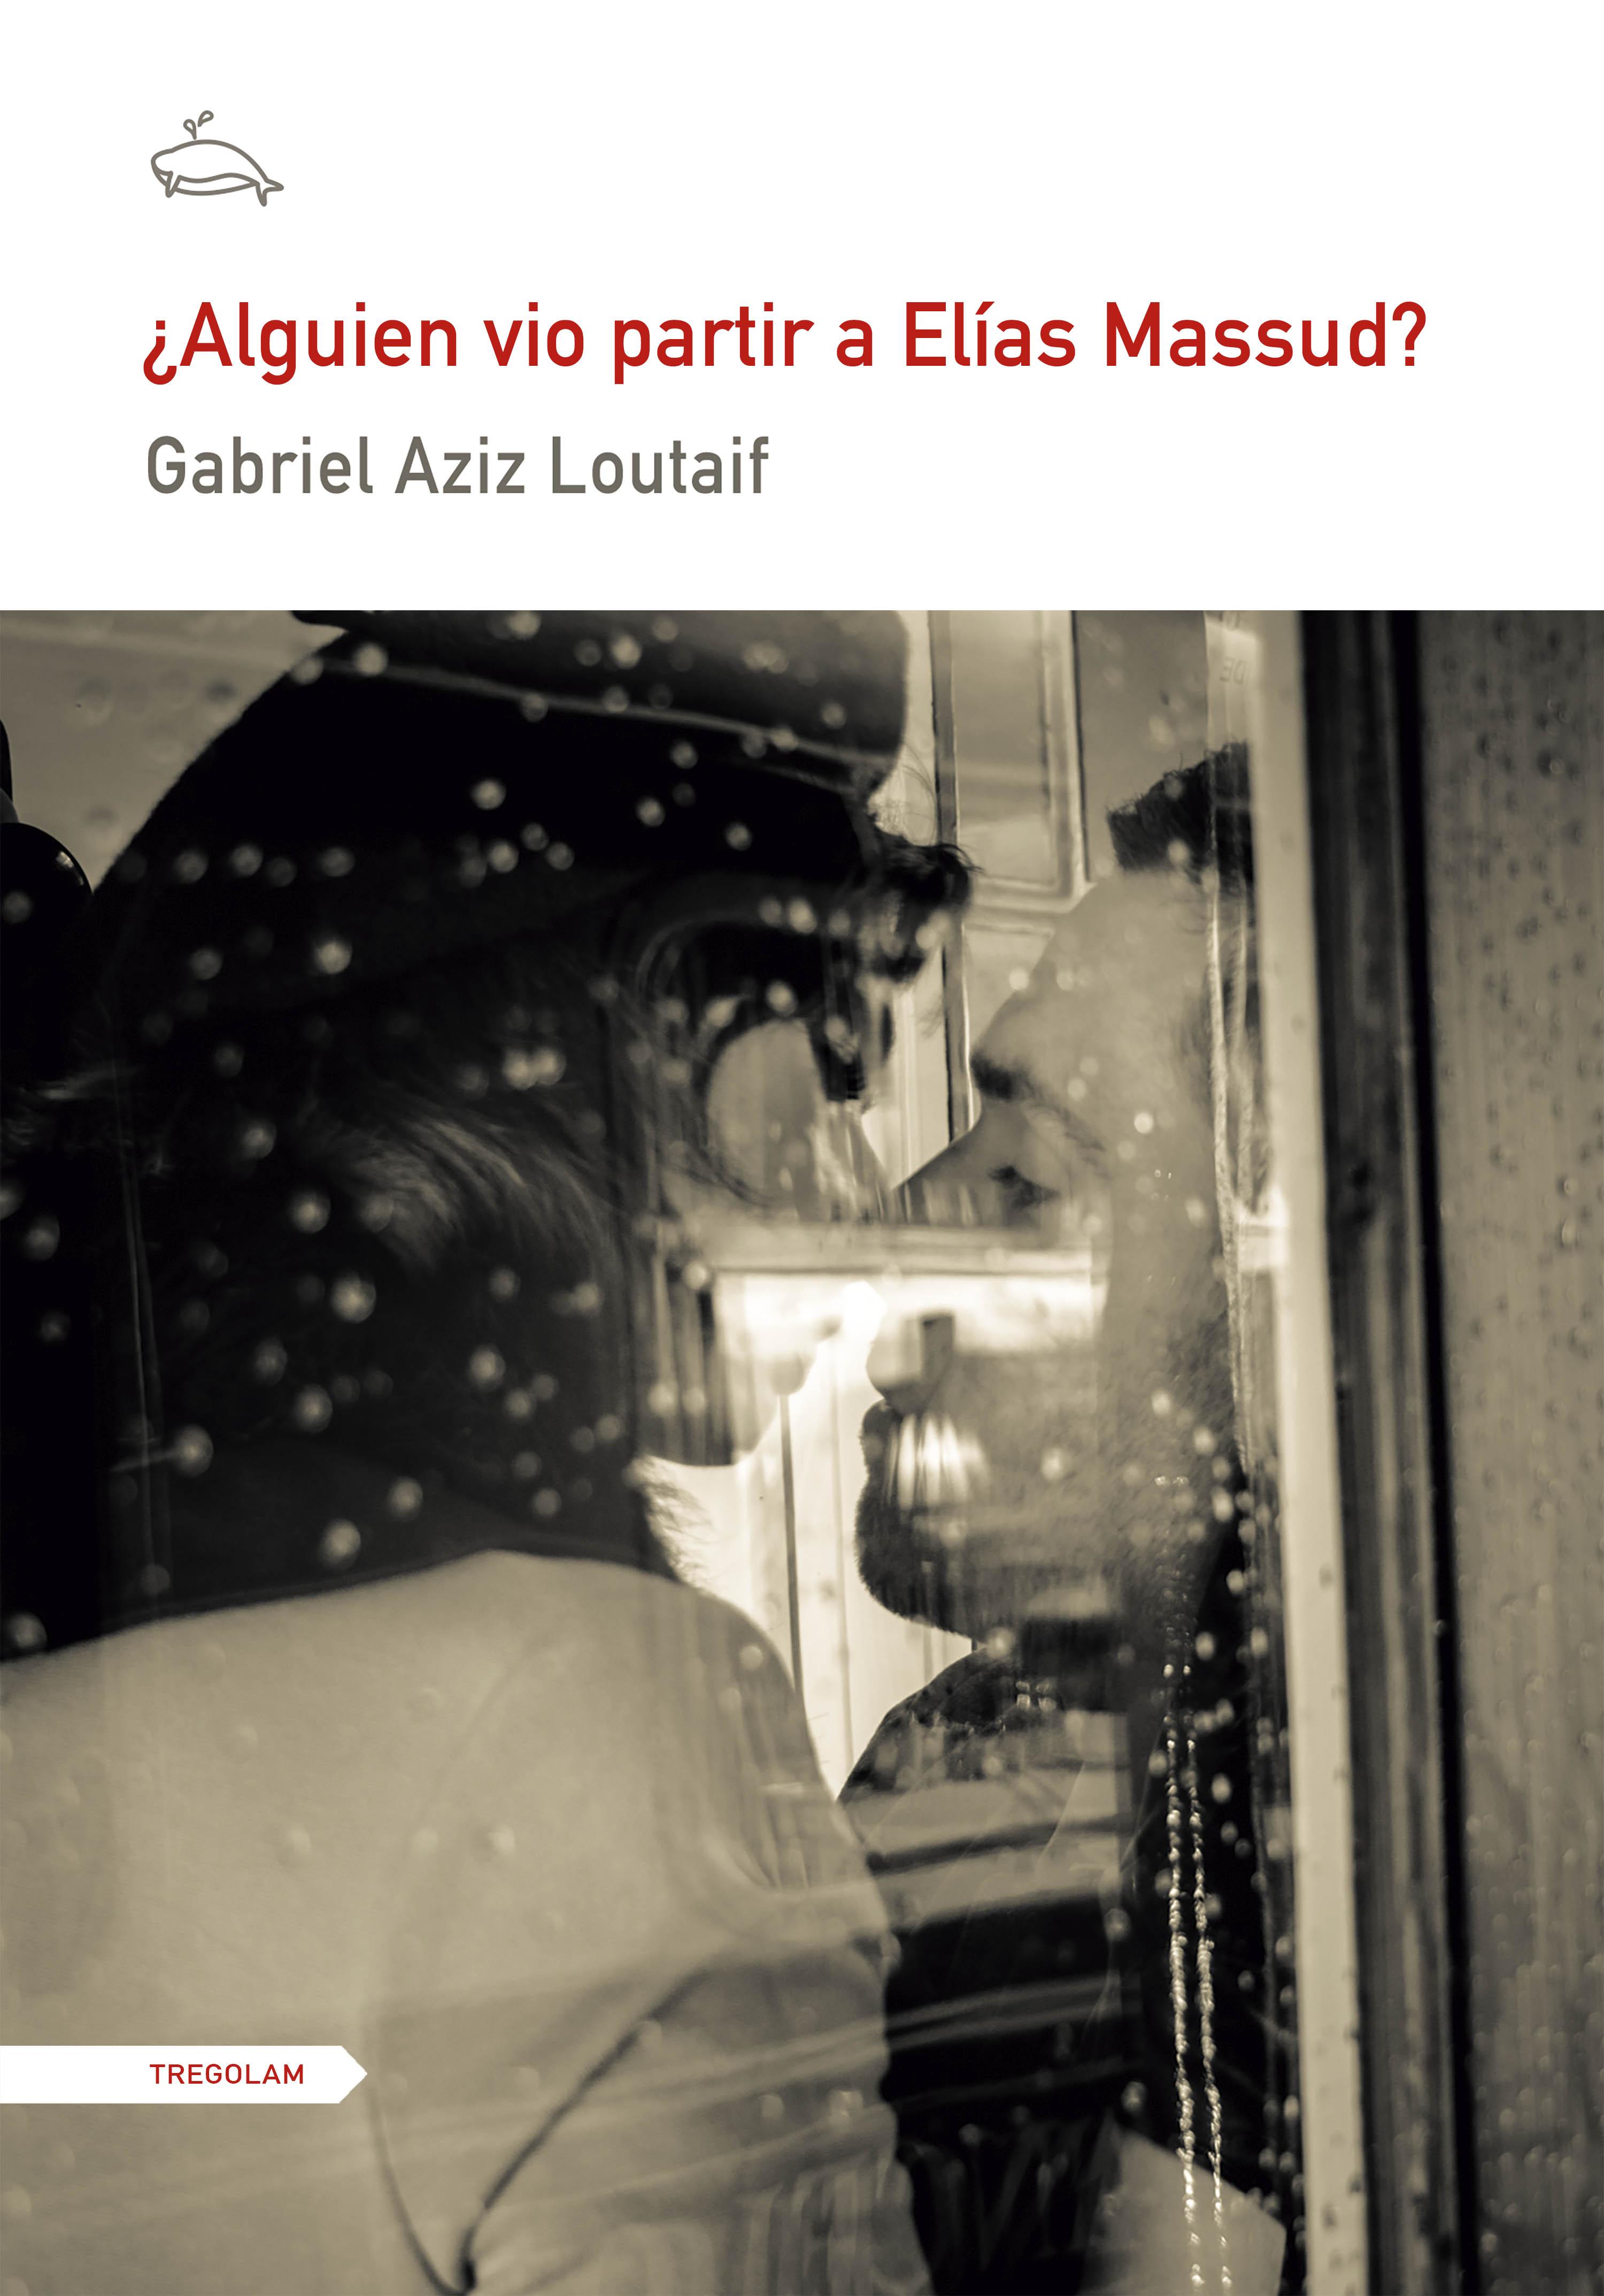 Gabriel Aziz Loutaif ¿Alguien vio partir a Elías Massud? все цены